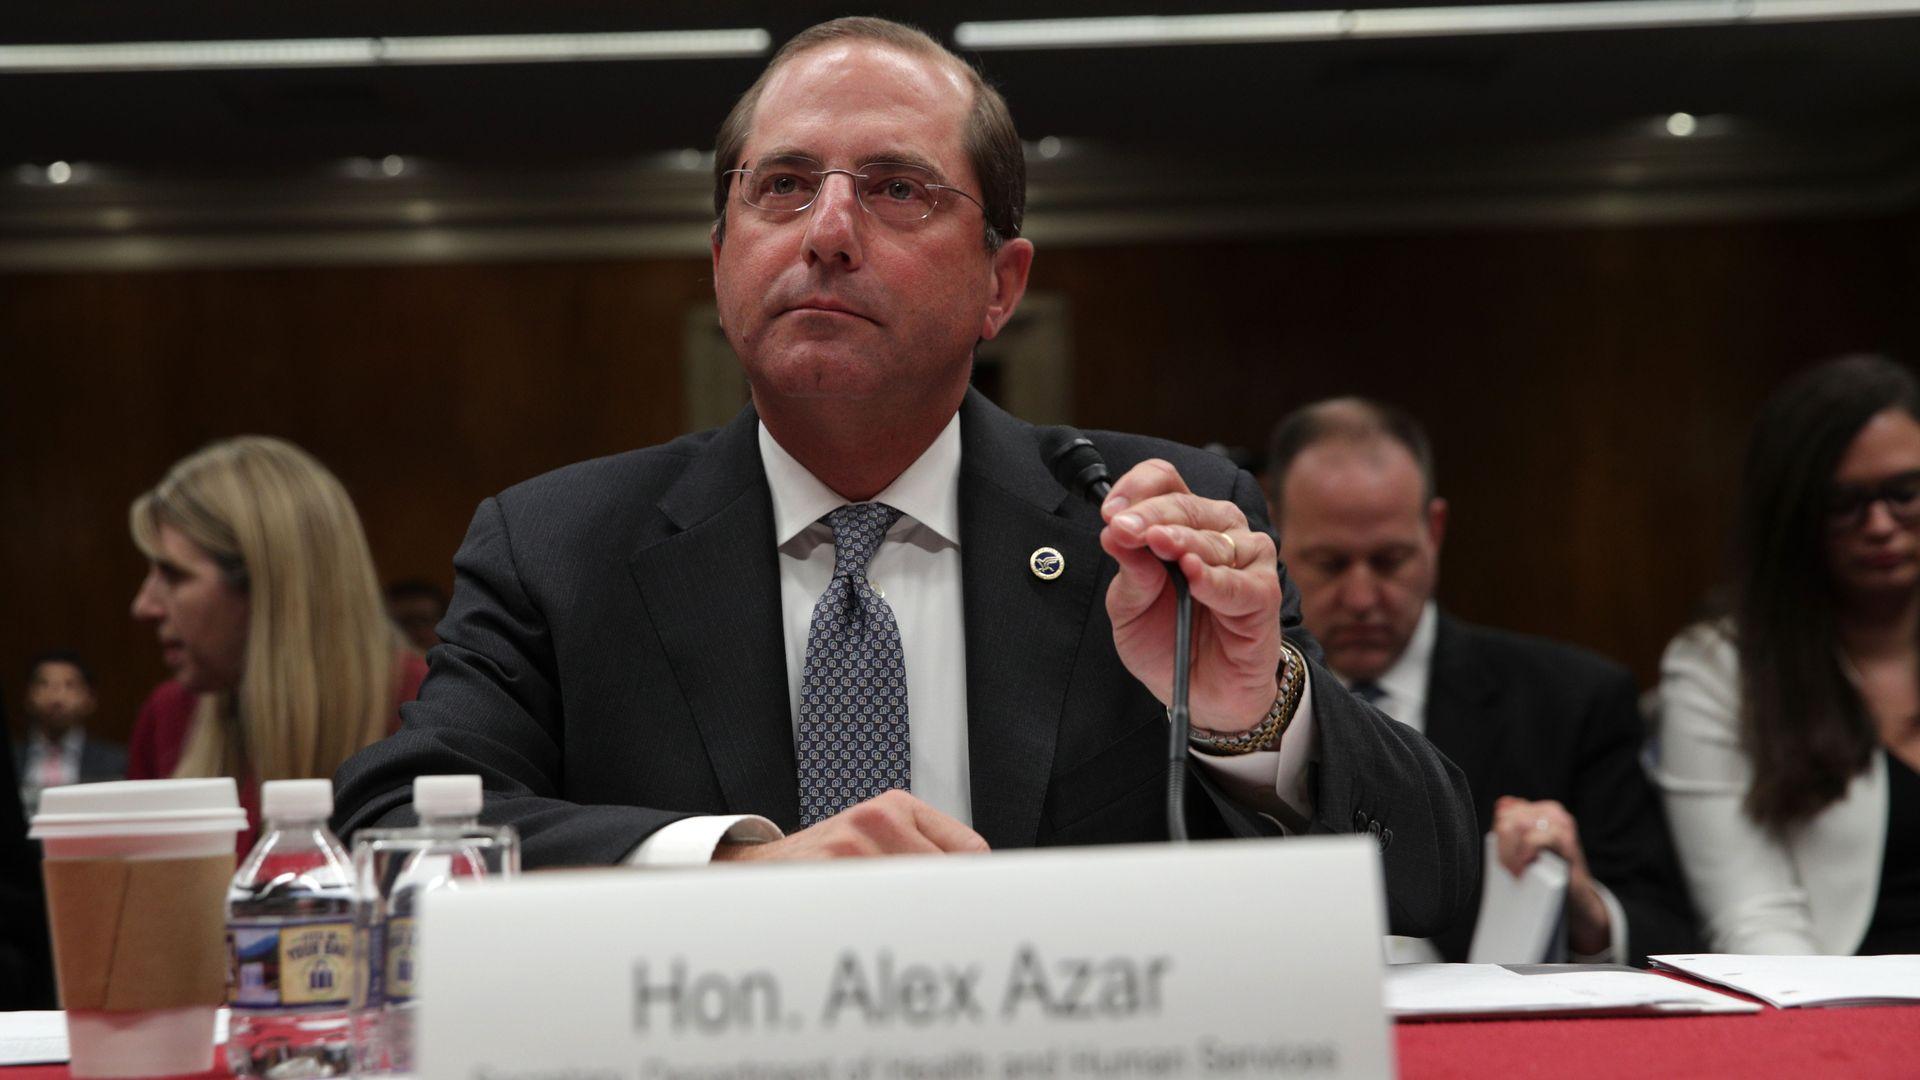 HHS Sec. Alex Azar